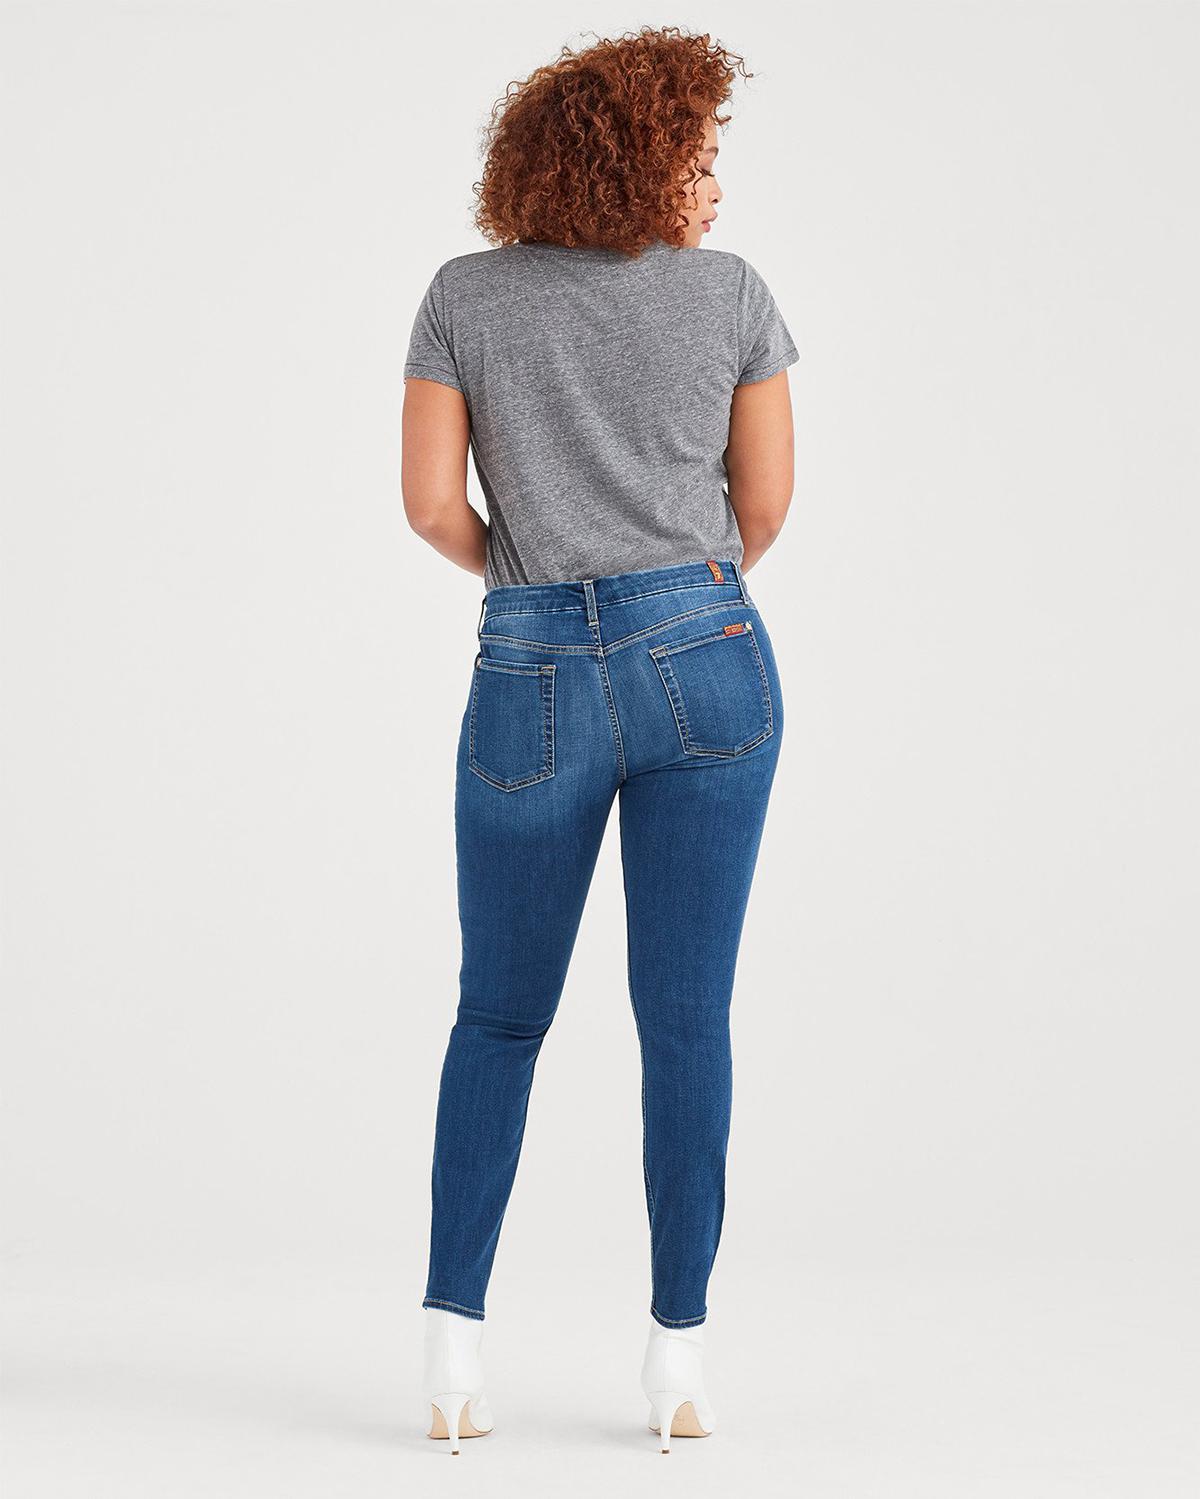 7 jeans back